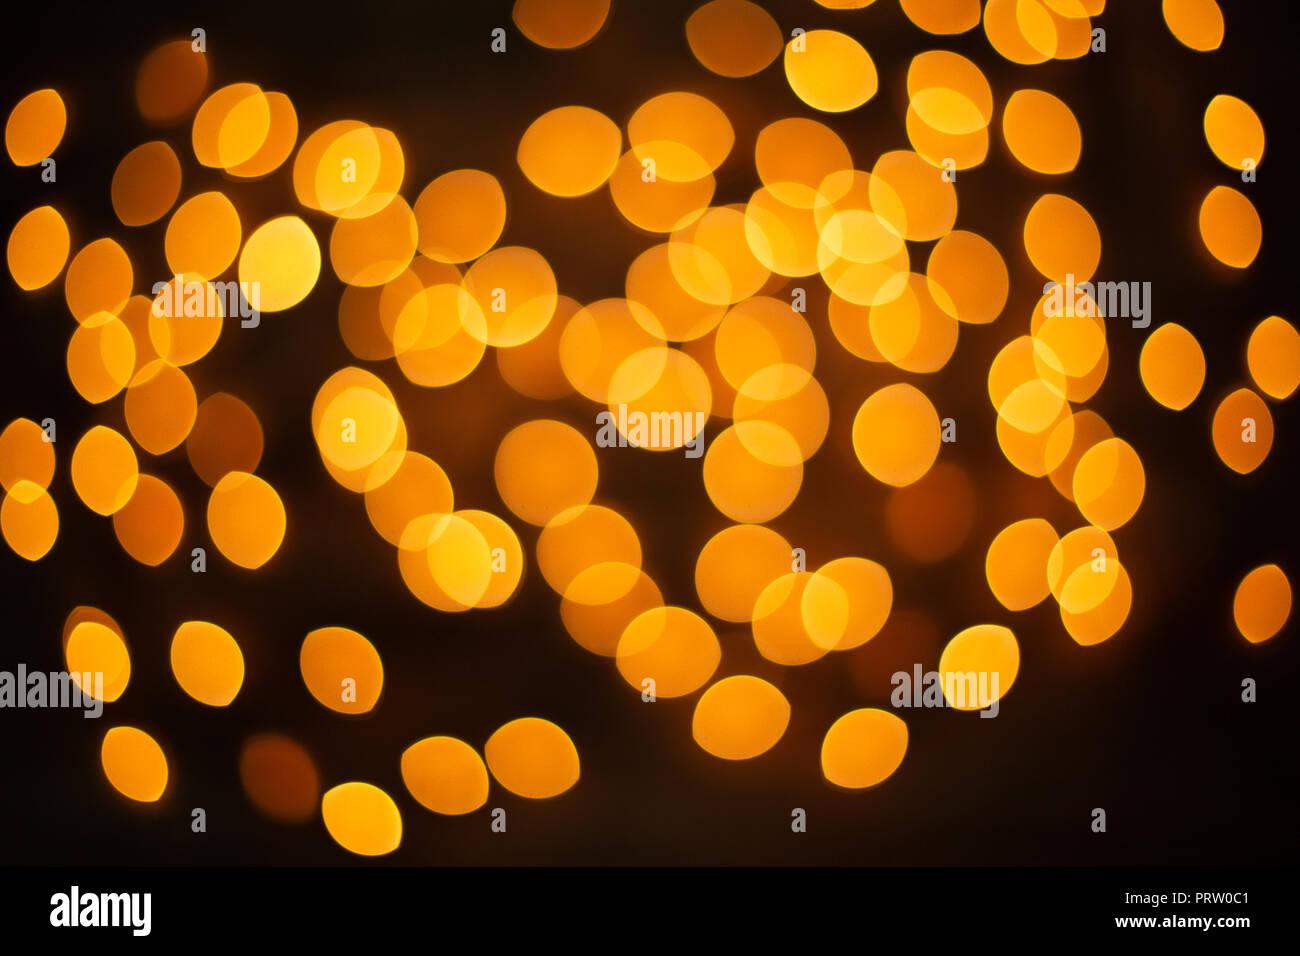 unfocused yellow Christmas light - Stock Image